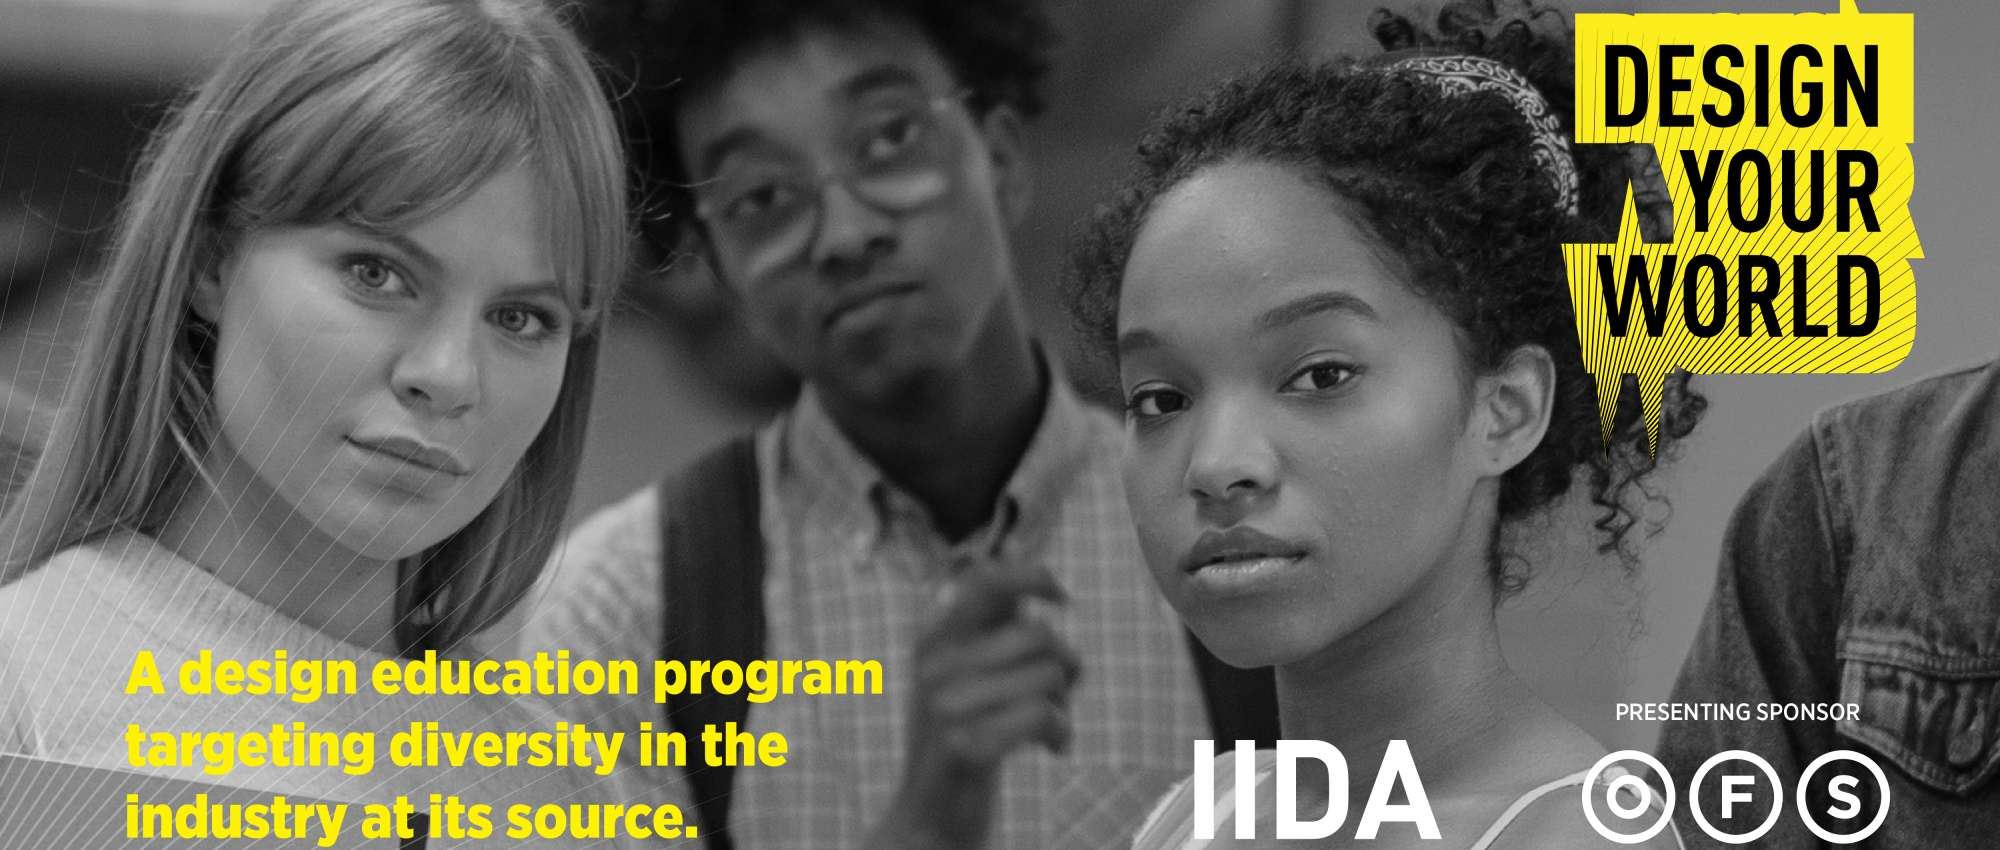 Design your world OFS IIDA